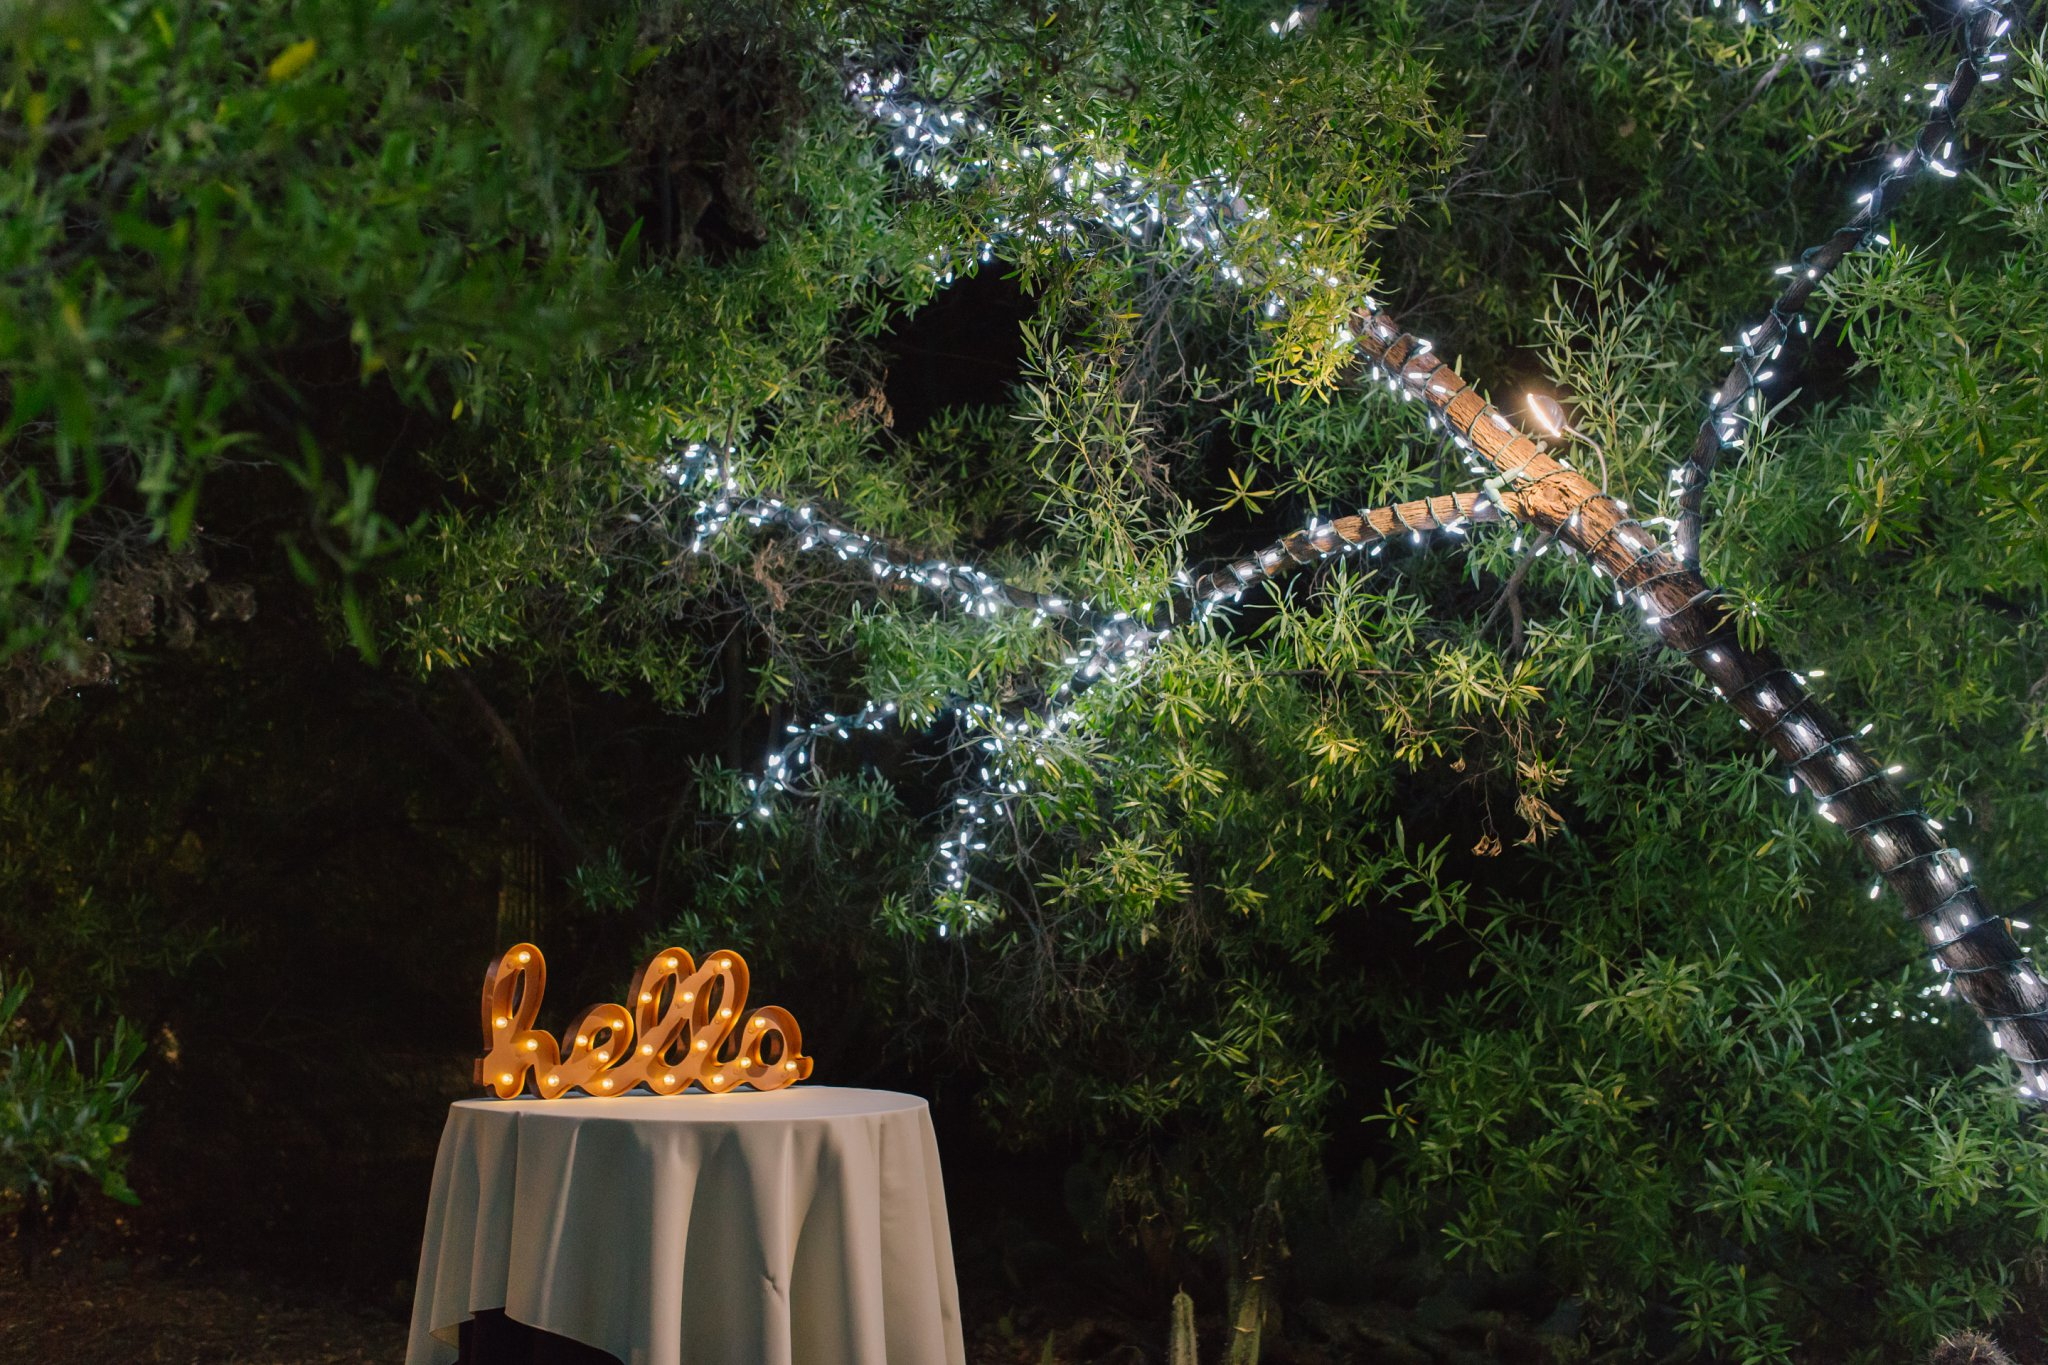 Phoenix Zoo outdoor wedding reception